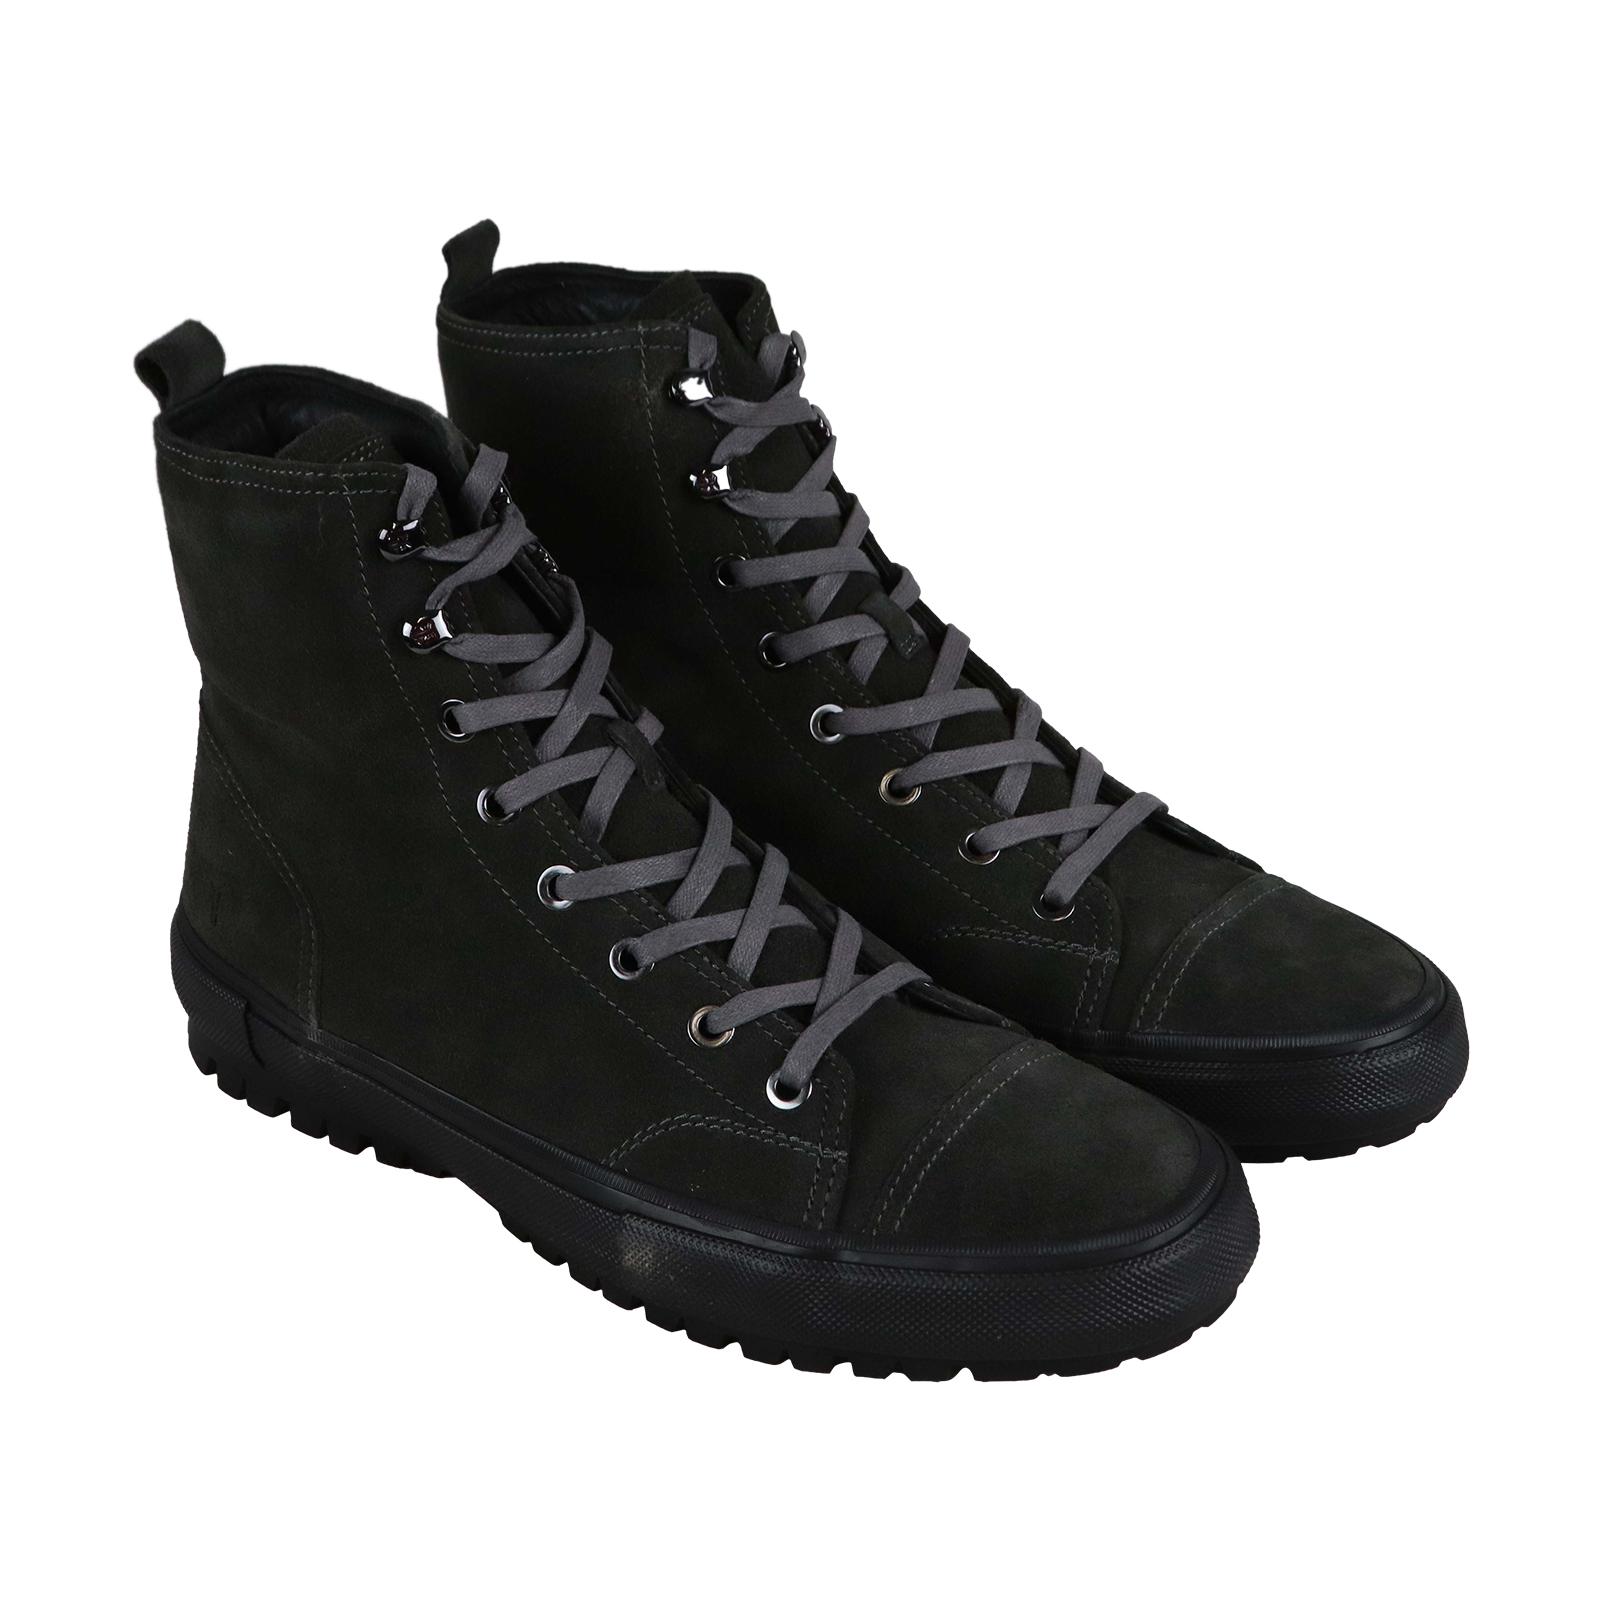 Frye Ryan militar para hombres gris de Ante Zapatos botas Con Cordones táctico